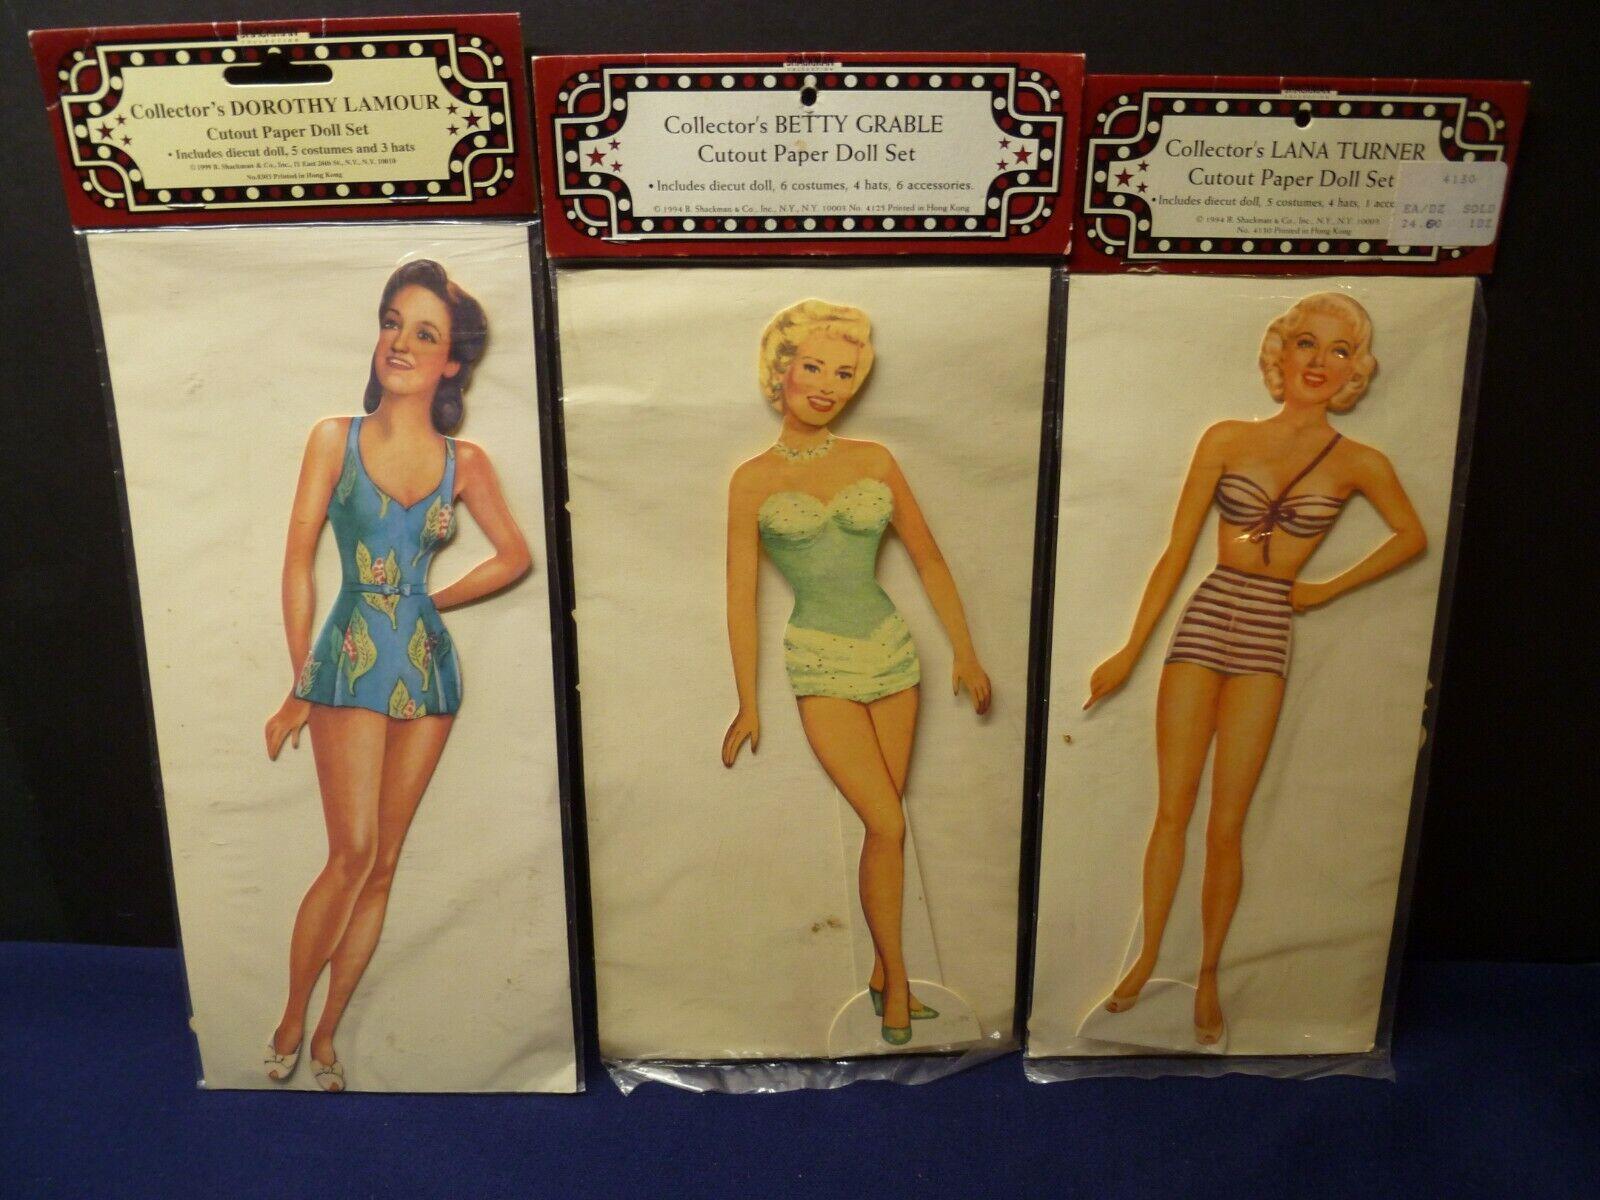 Sealed 1994 Collector s Celebrity Paper Dolls 3 Sets Grable, Turner, Lamour - $9.95